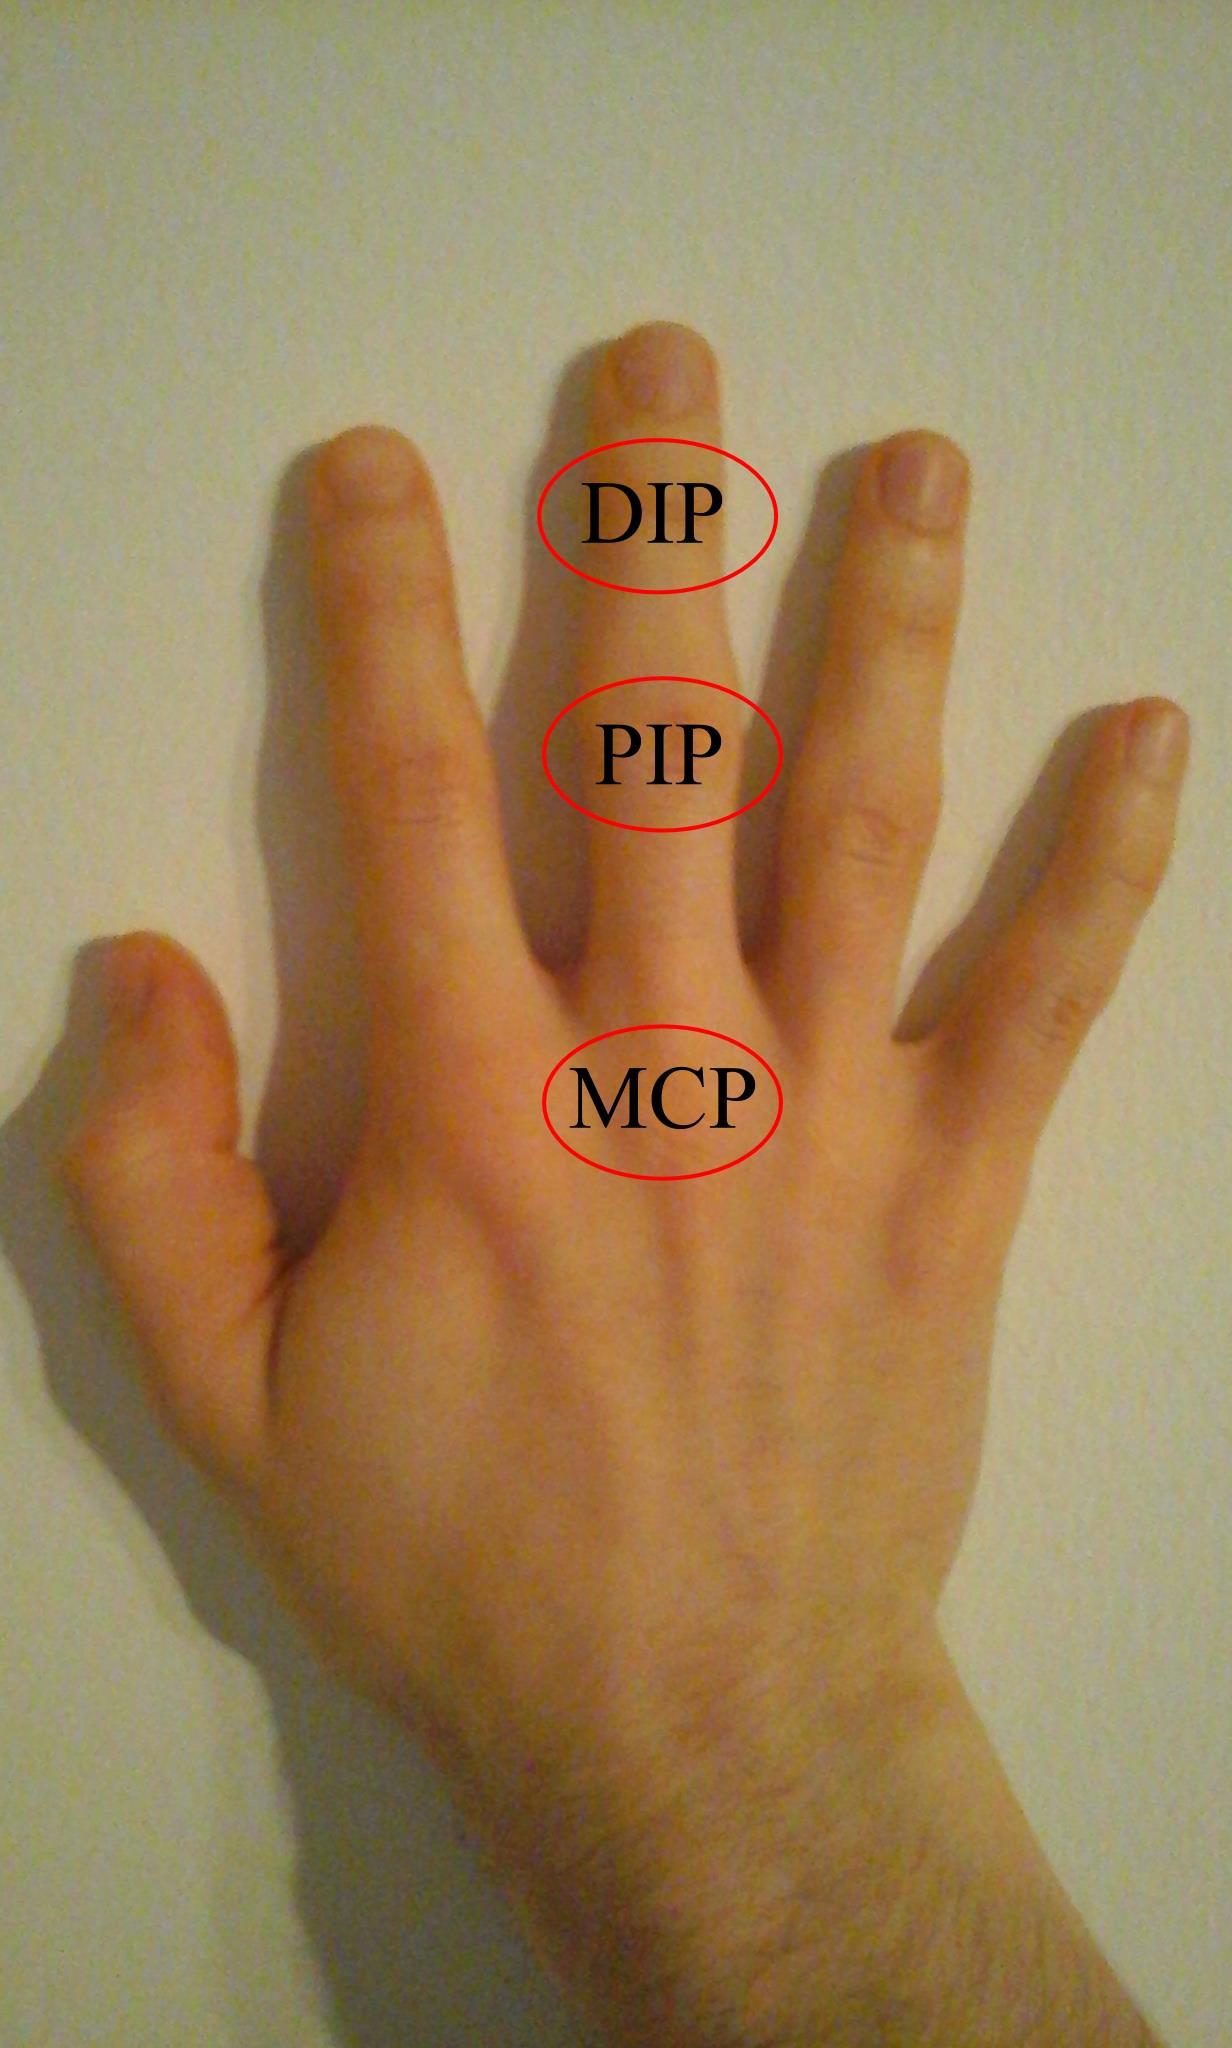 a kezek rheumatoid arthritis tünetei nőkben)